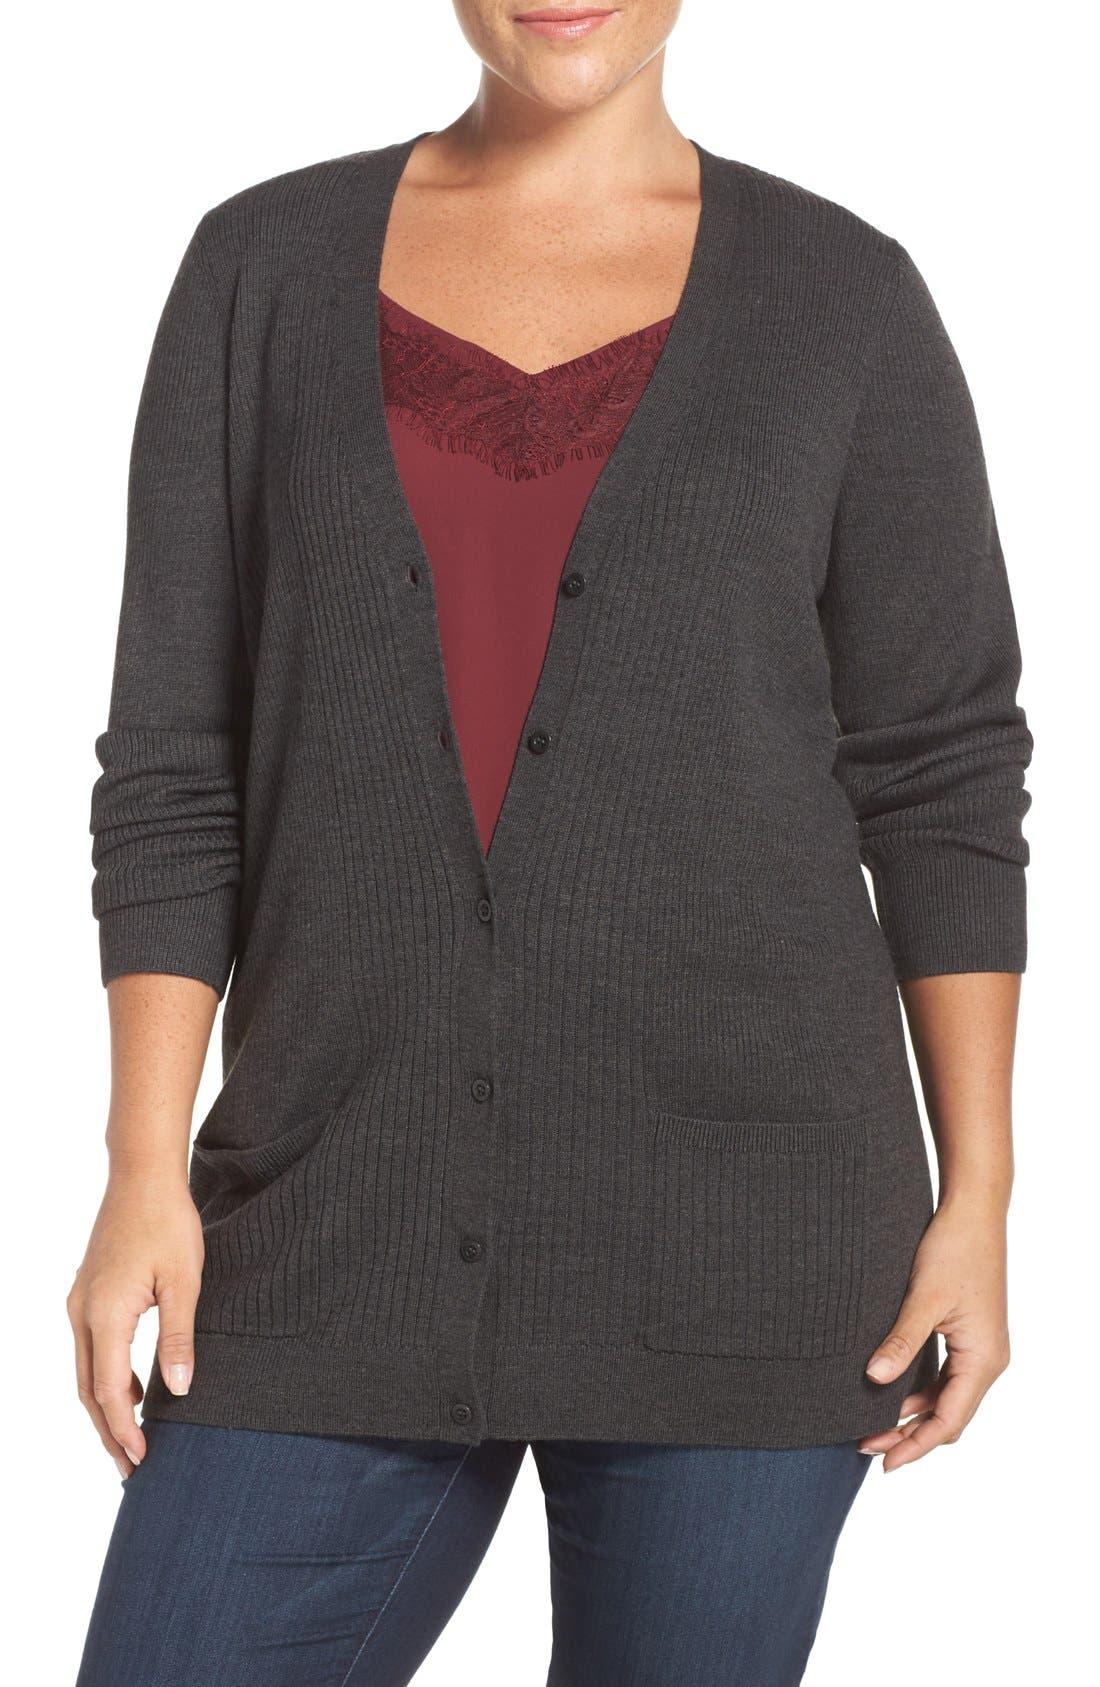 Alternate Image 1 Selected - Sejour Ribbed V-Neck Cardigan (Plus Size & Petite Plus)